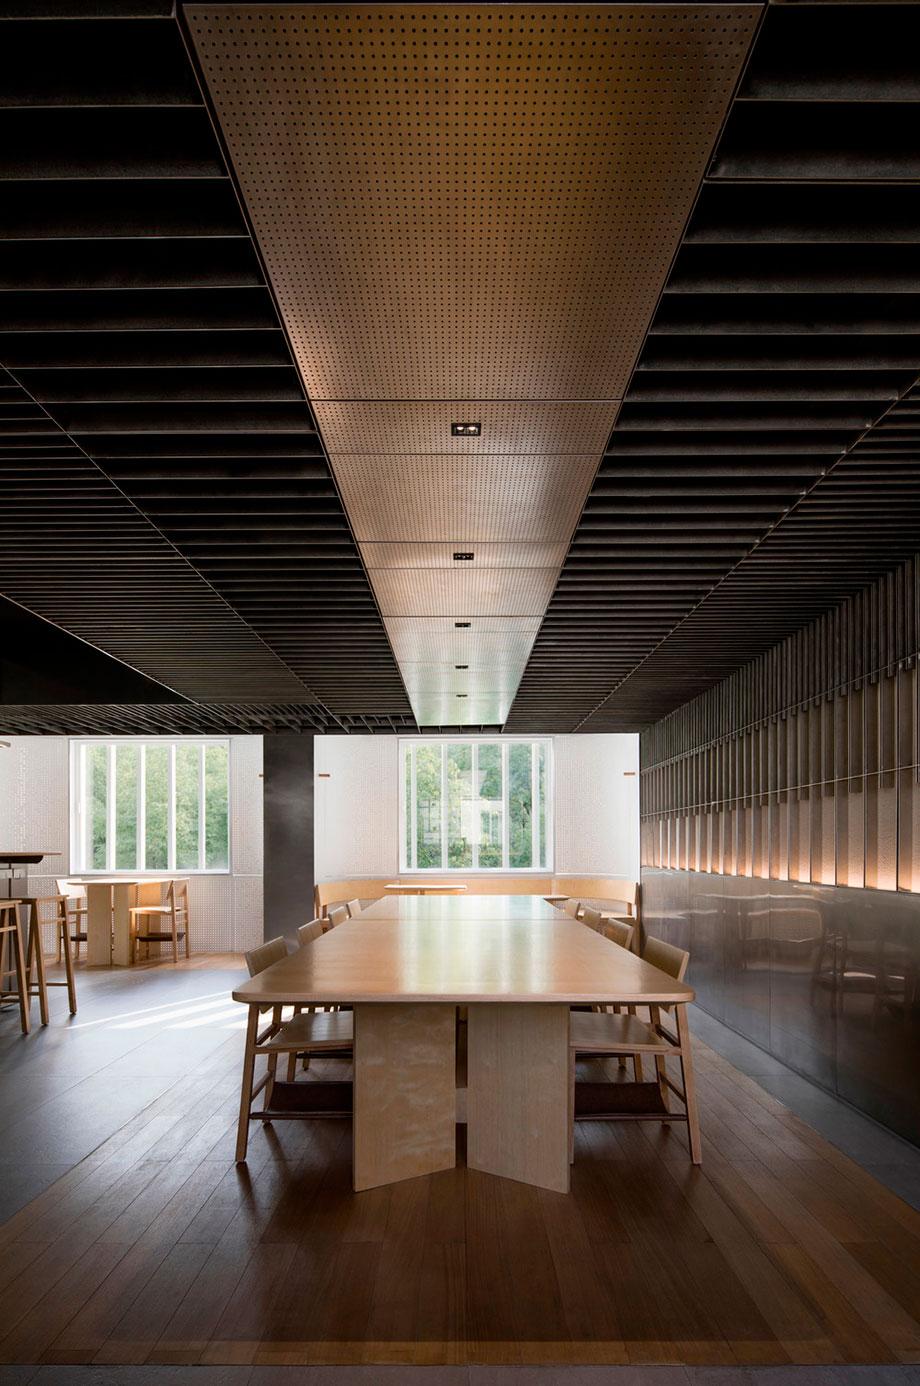 the zentral kitchen de lukstudio (12) - foto peter dixie